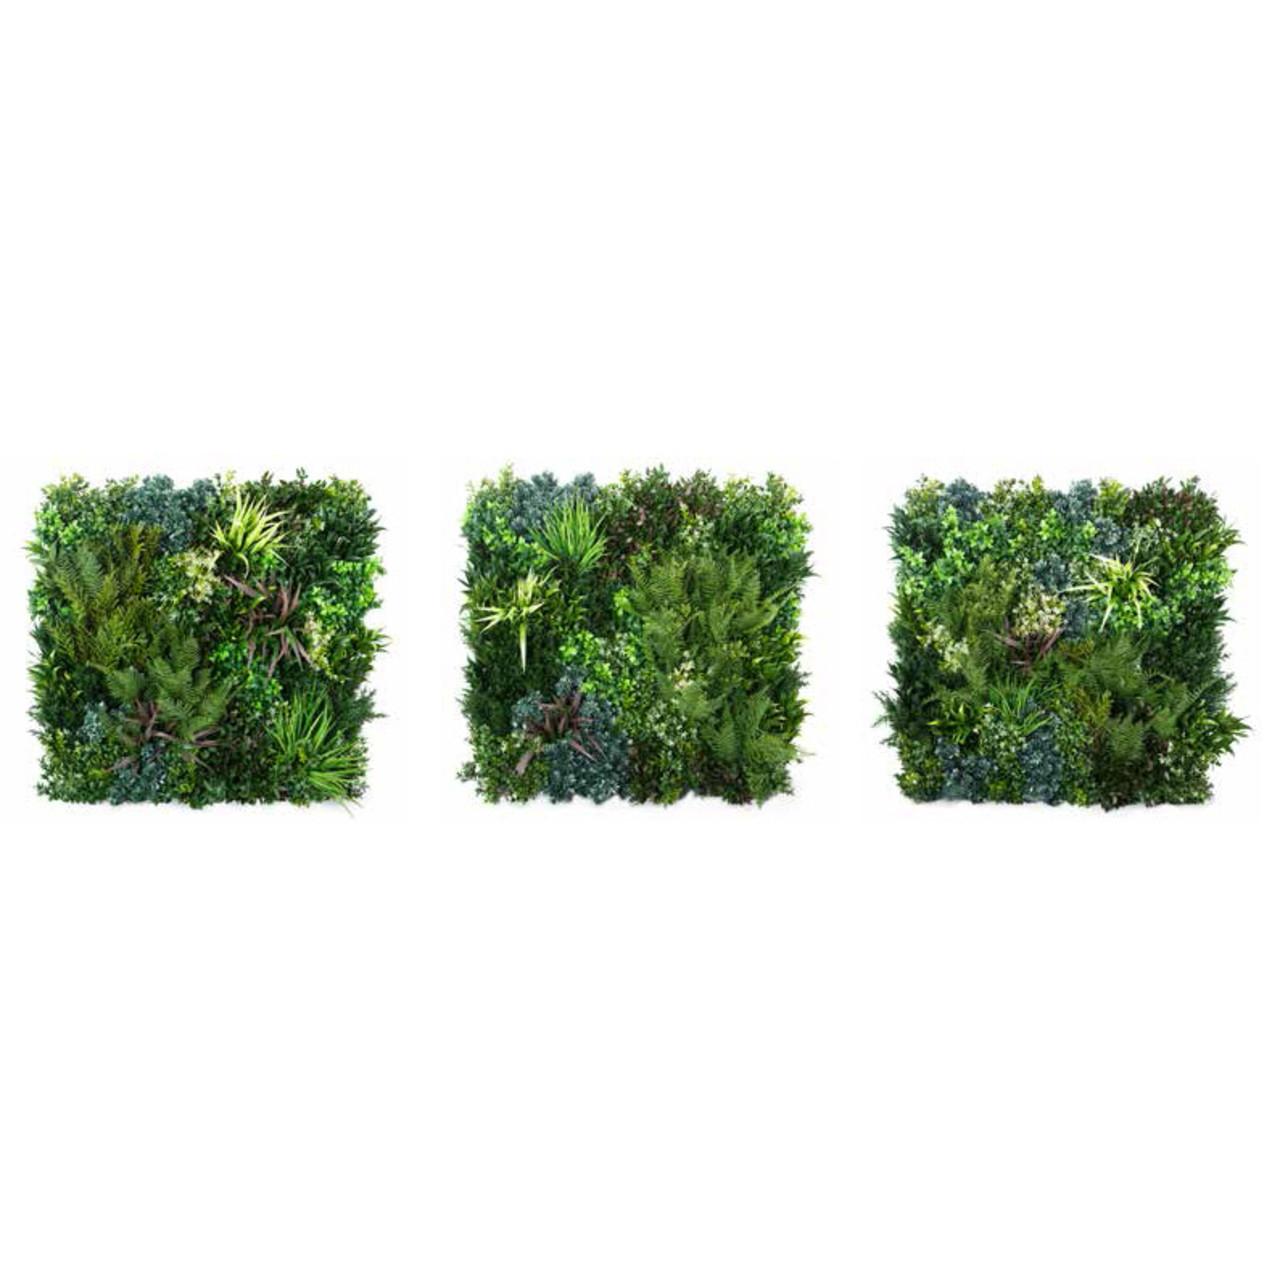 Groene wandpanelen, type Outdoor (80 x 80 cm)